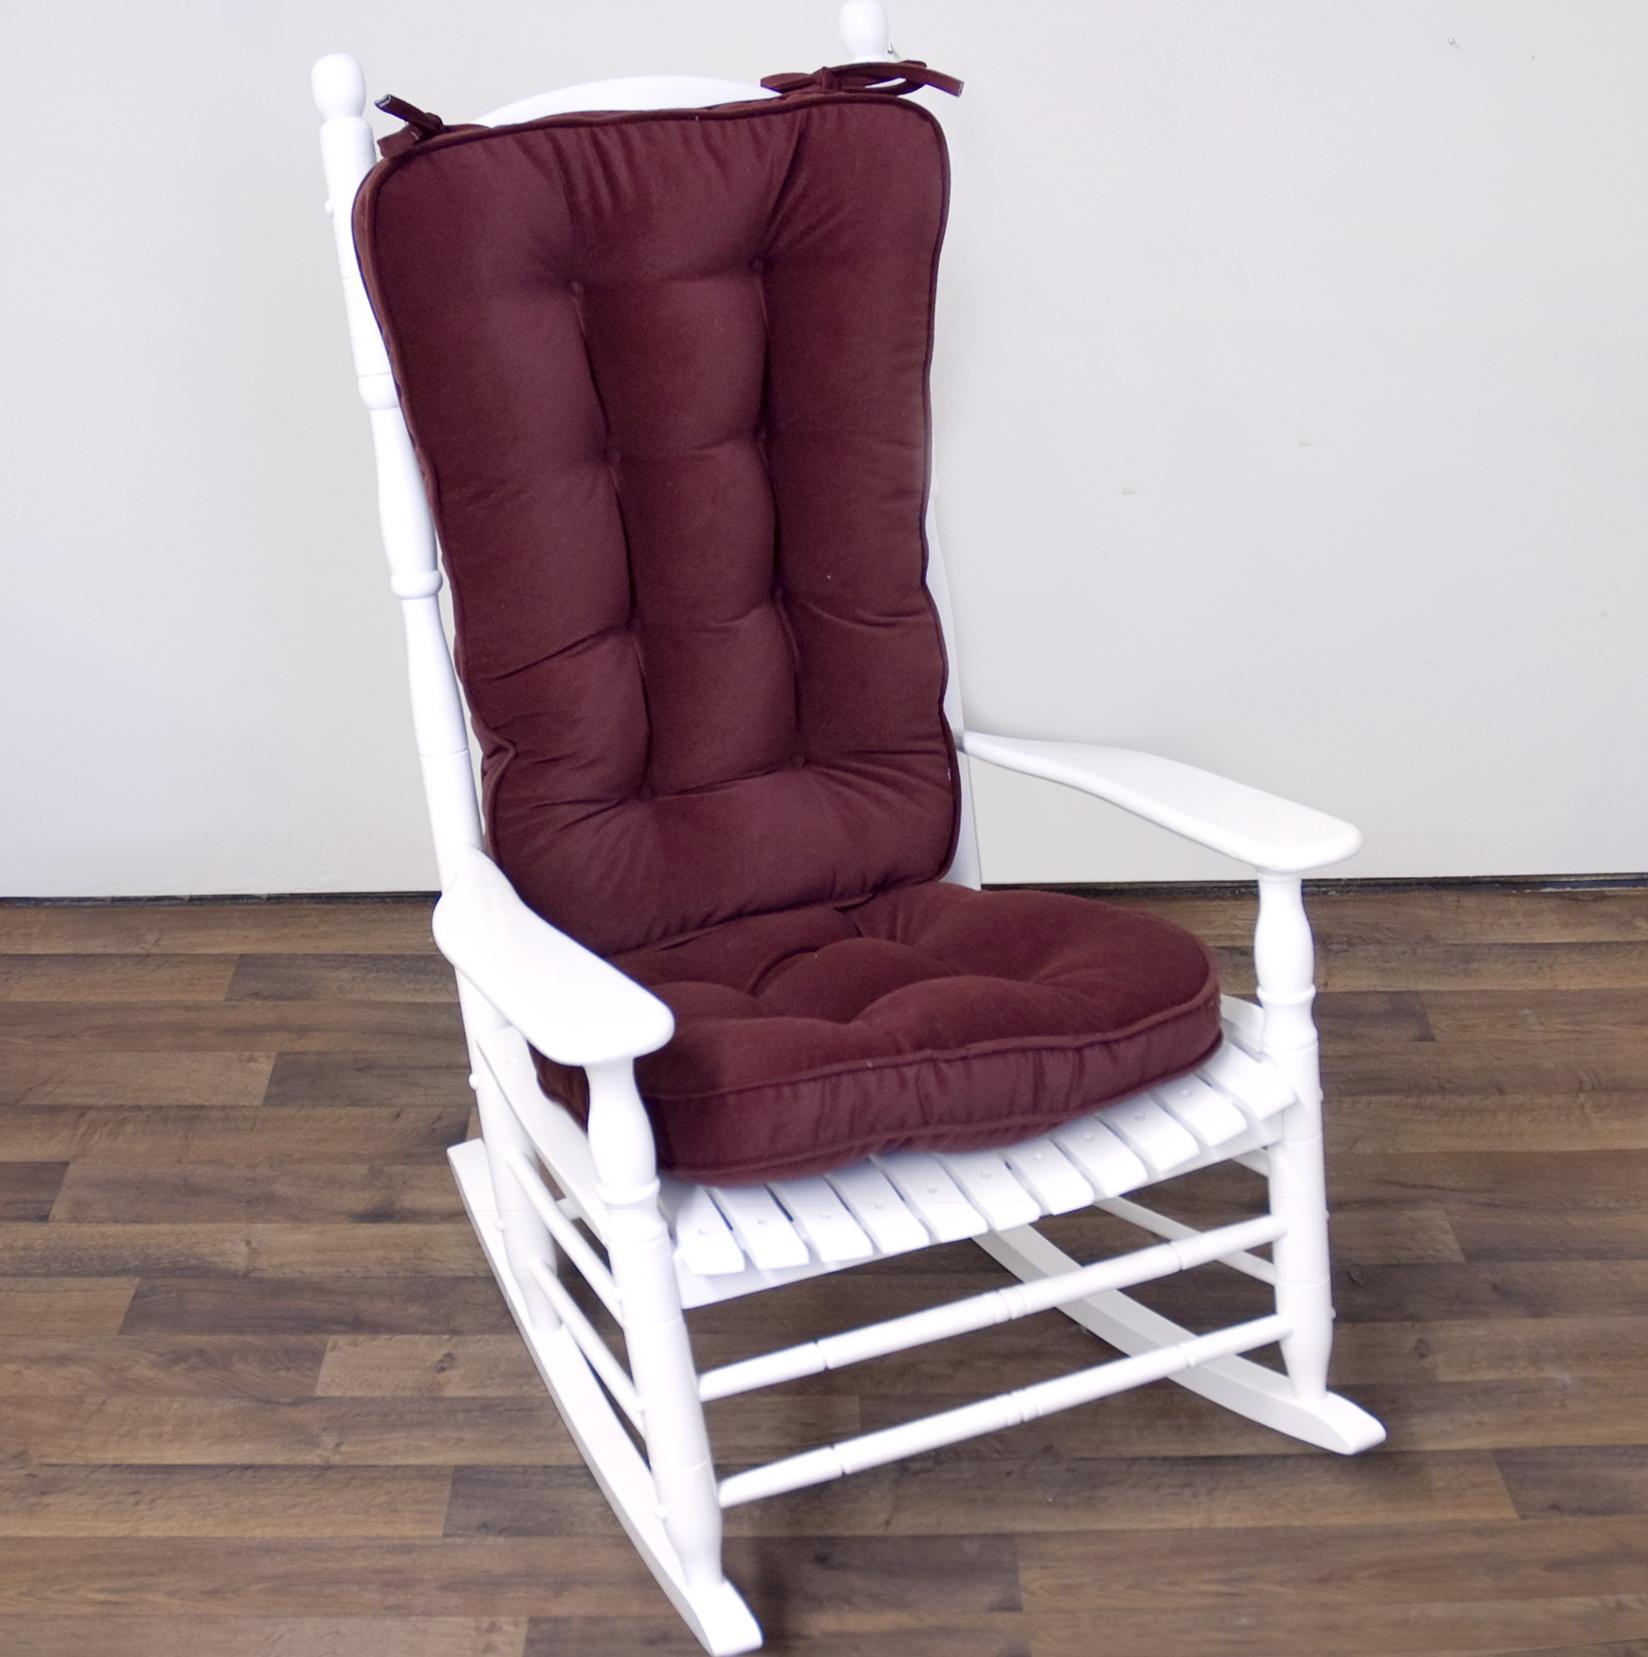 Cushioned Rocking Chair Uk